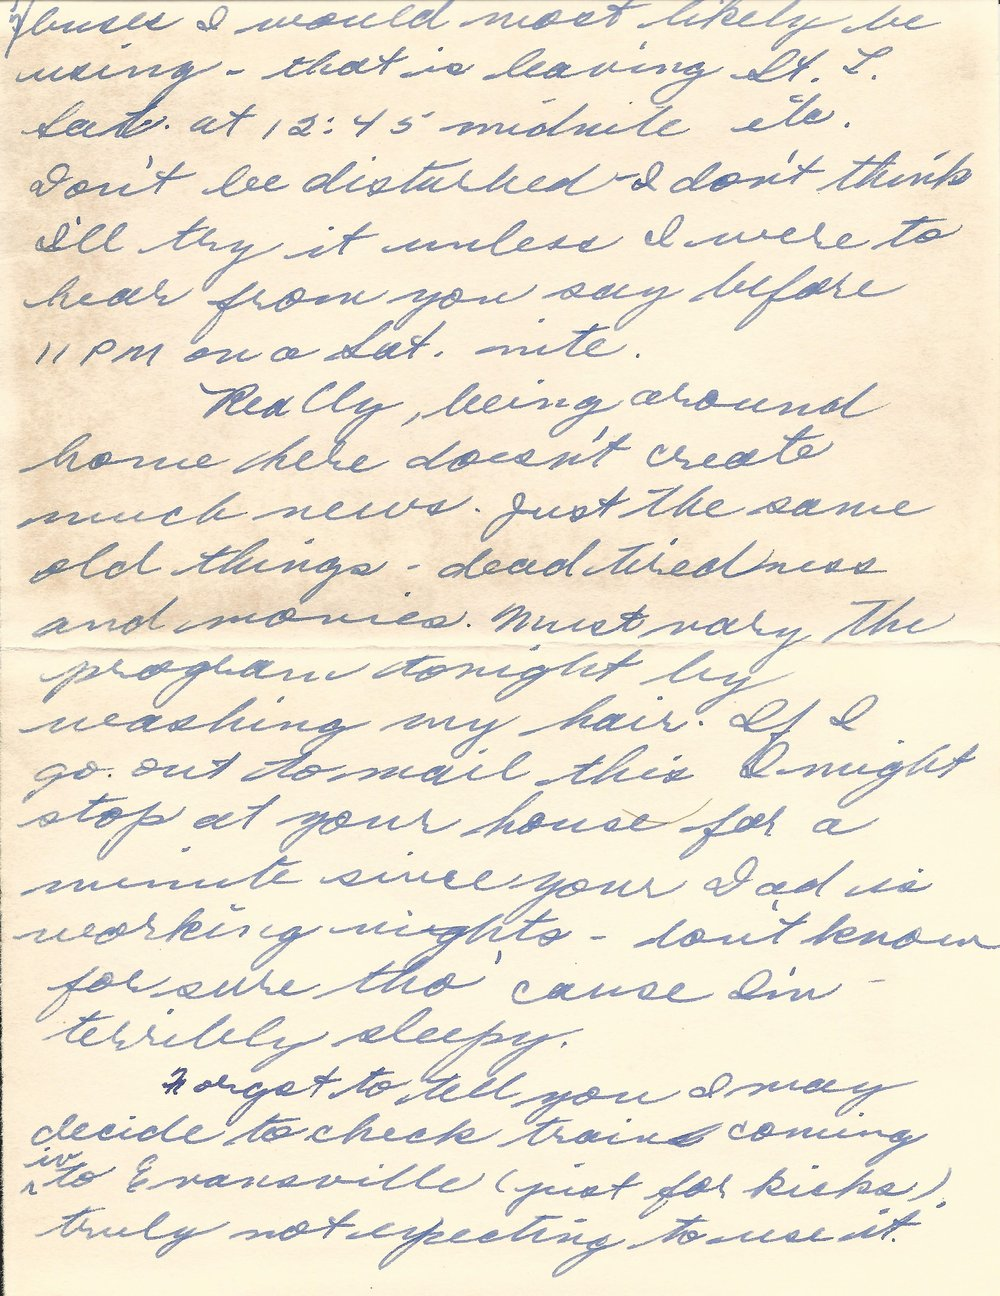 3. Nov. 4-5, 1952 (Oma)_Page_6.jpg